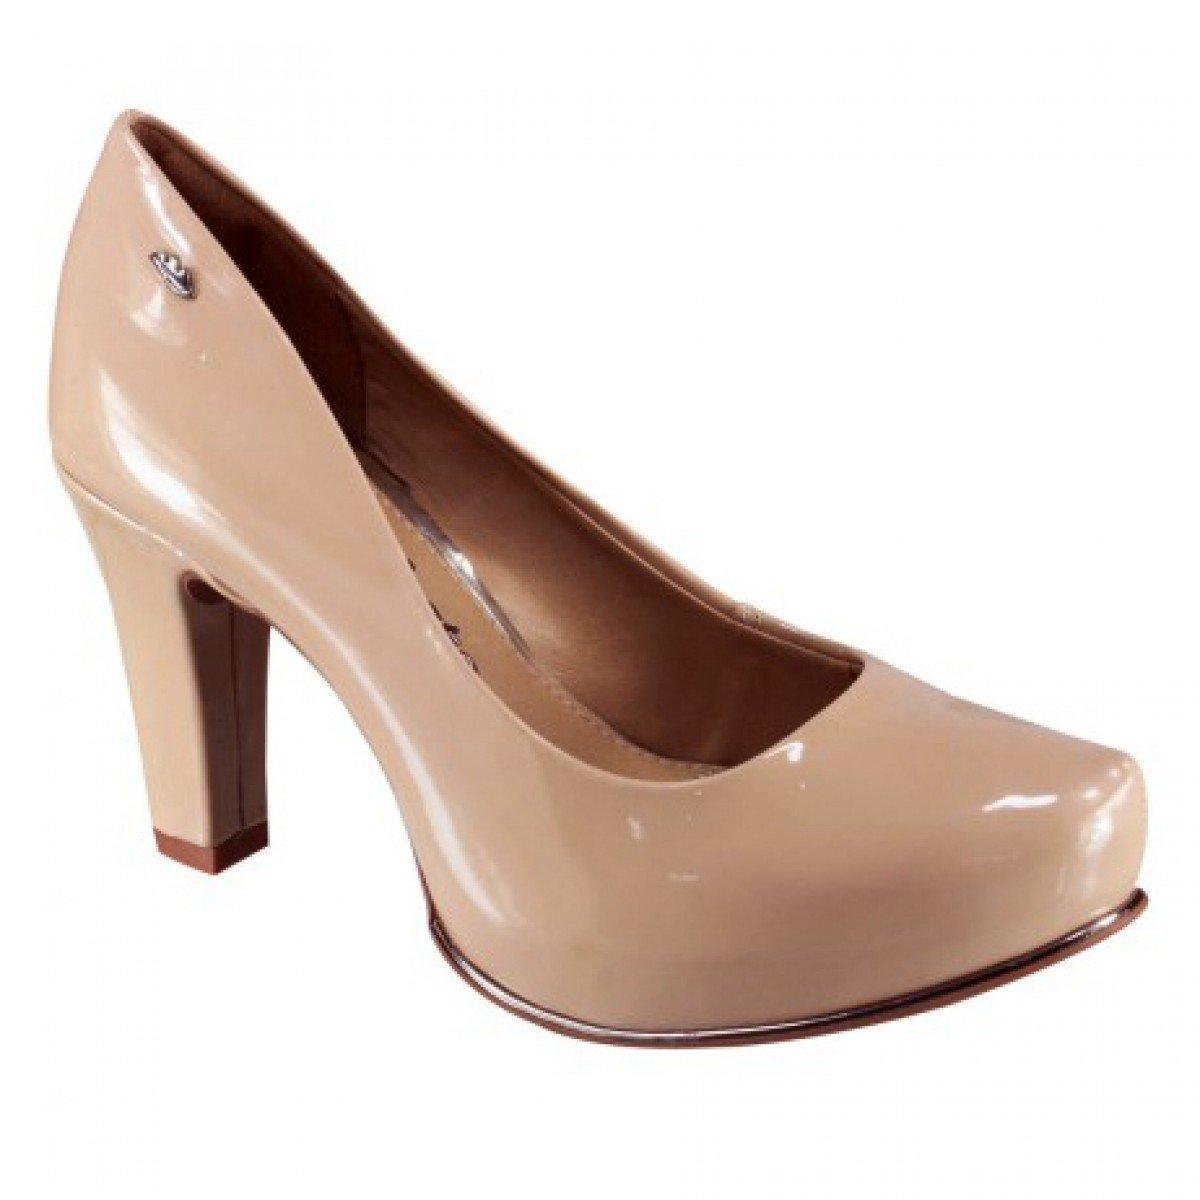 470cf3f6f0 Sapato Dakota Meia Pata Fontana Nude Feminino - Compre Agora